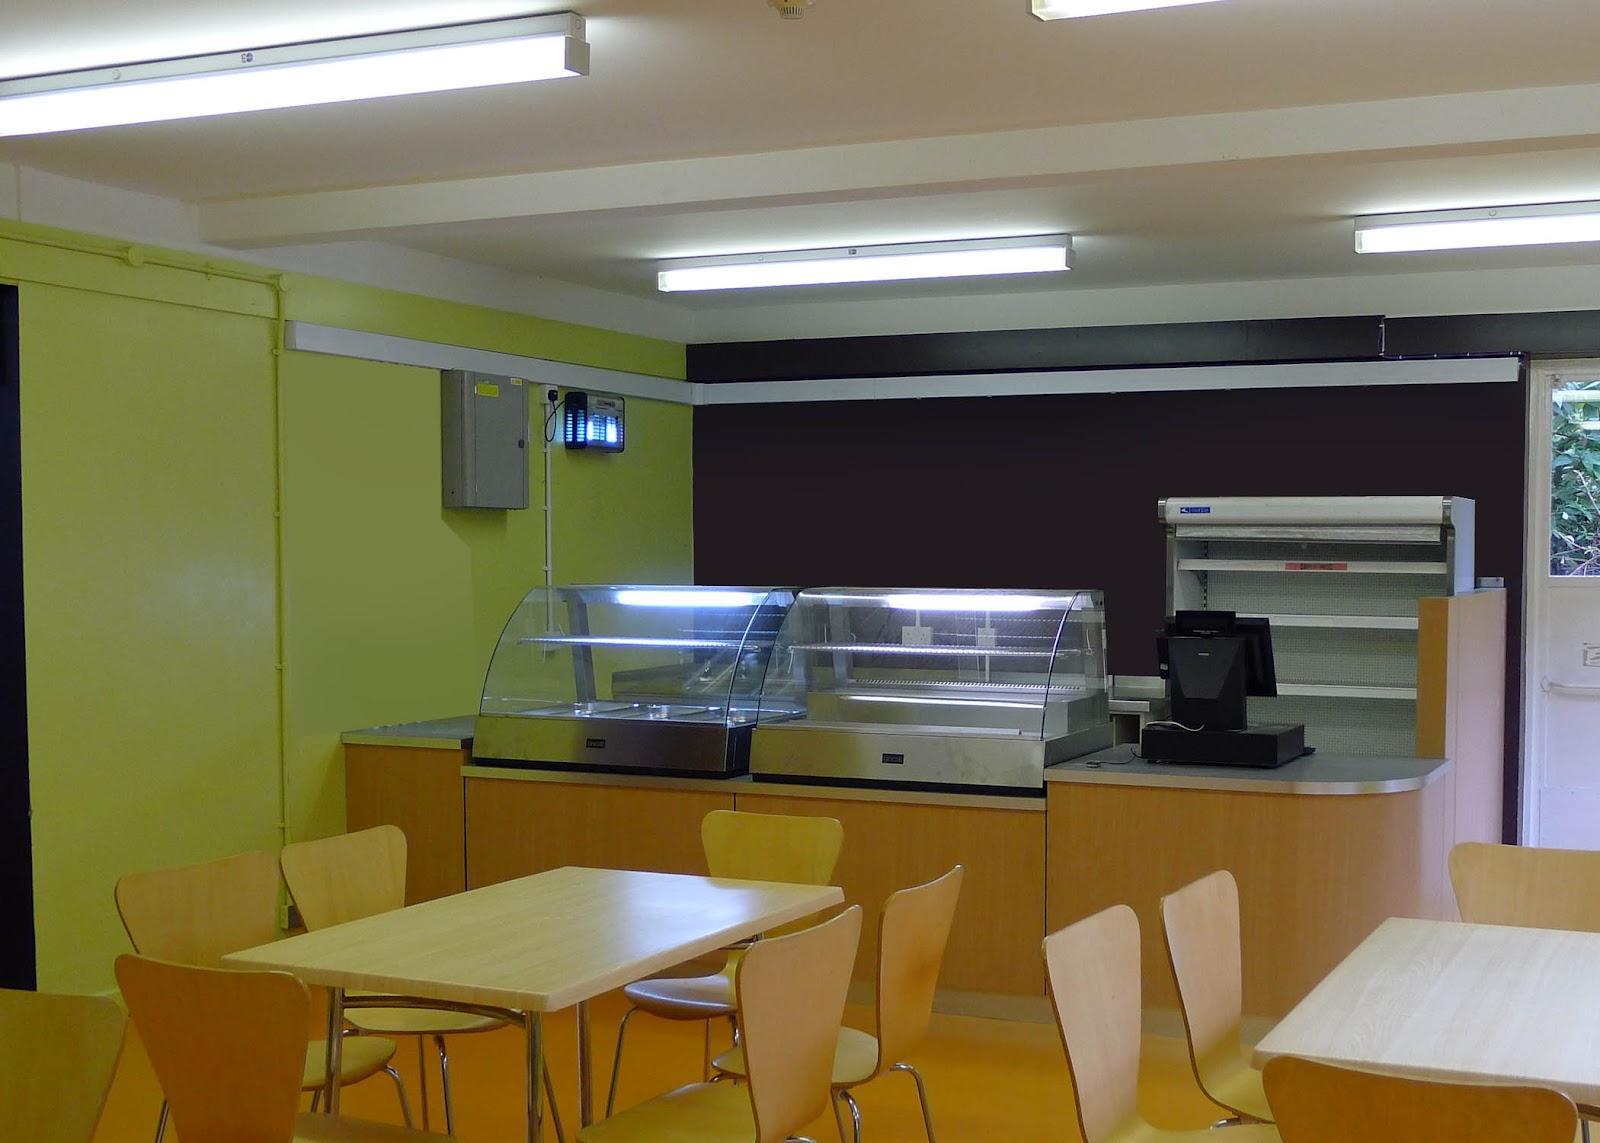 Summer 2012 uckfield school sussex quantum design for Kitchen design uckfield